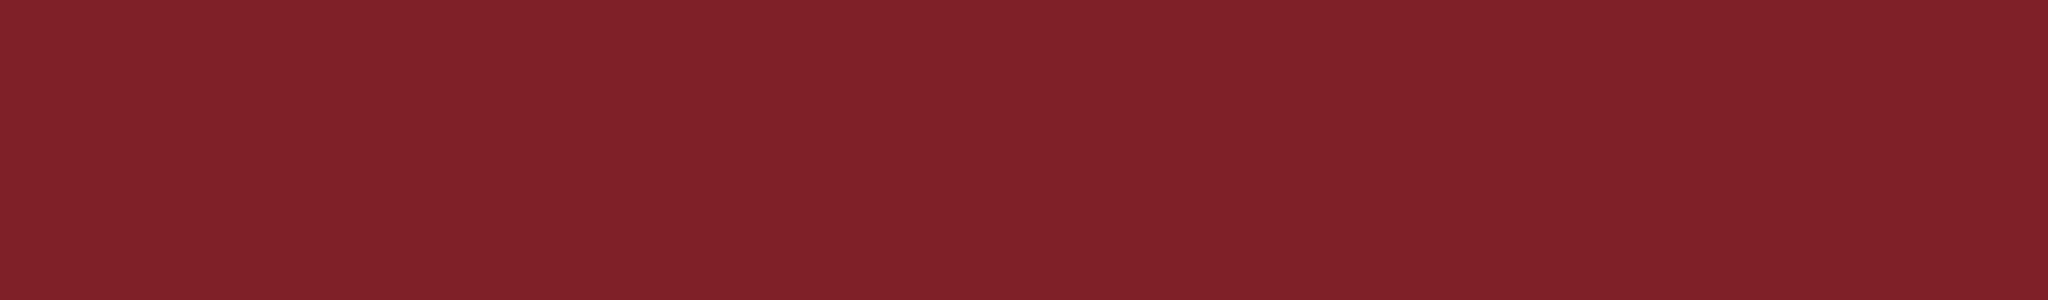 HSE 133216 ABS hrana s akryl fólií červená hladká lesk 90°